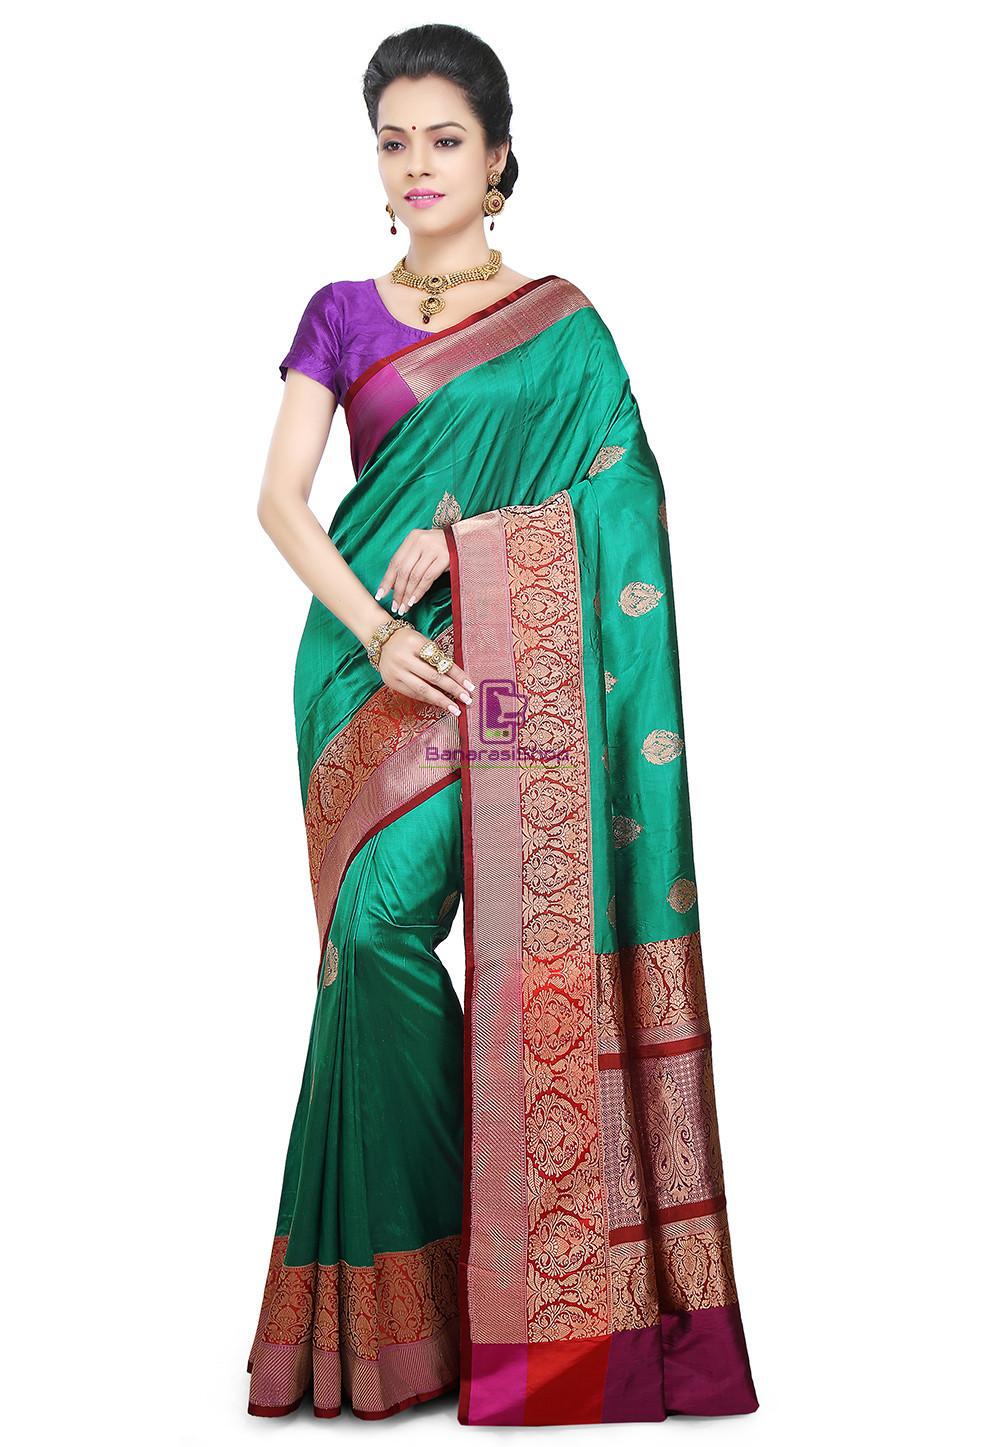 Banarasi Pure Katan Silk Handloom Saree in Teal Green 1